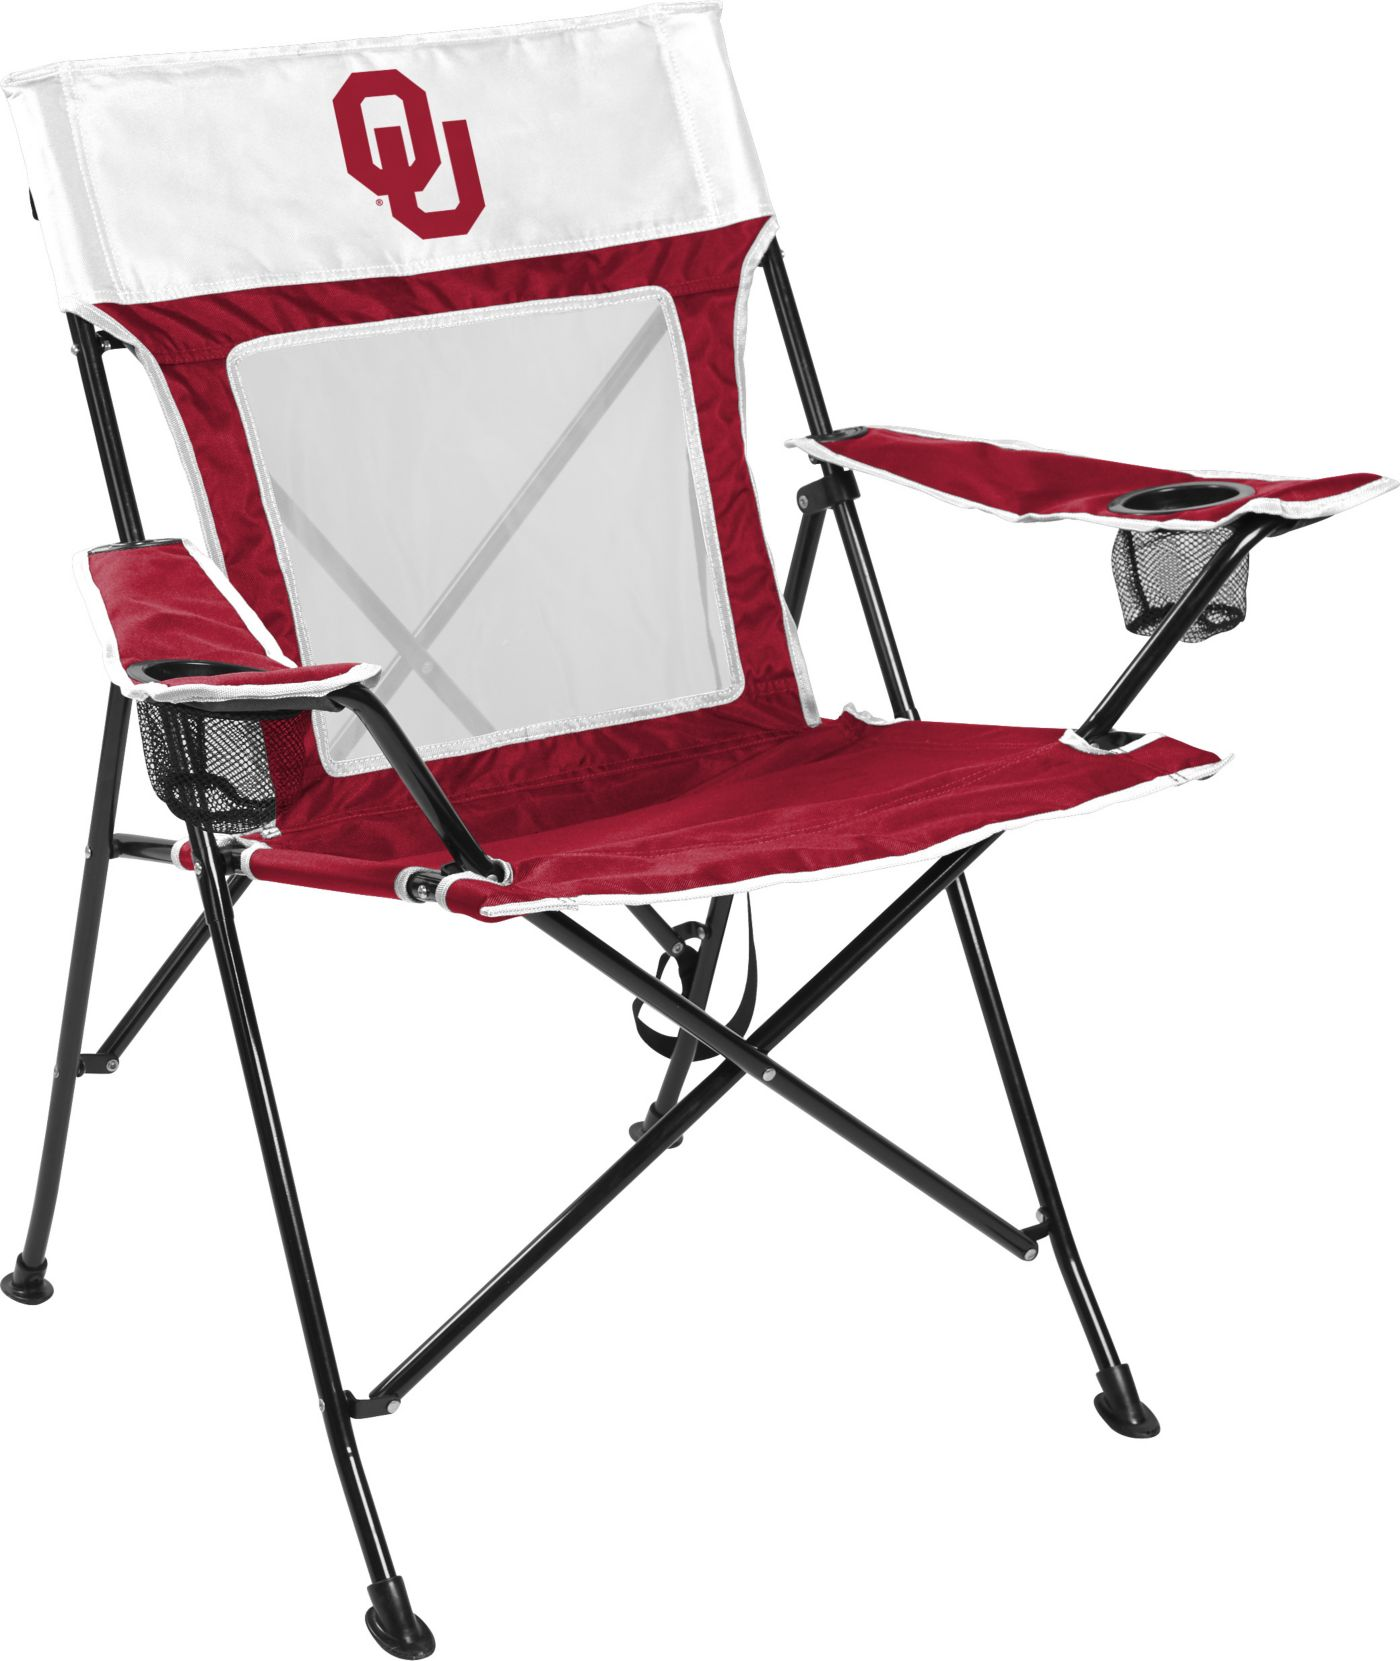 Rawlings Oklahoma Sooners Game Changer Chair